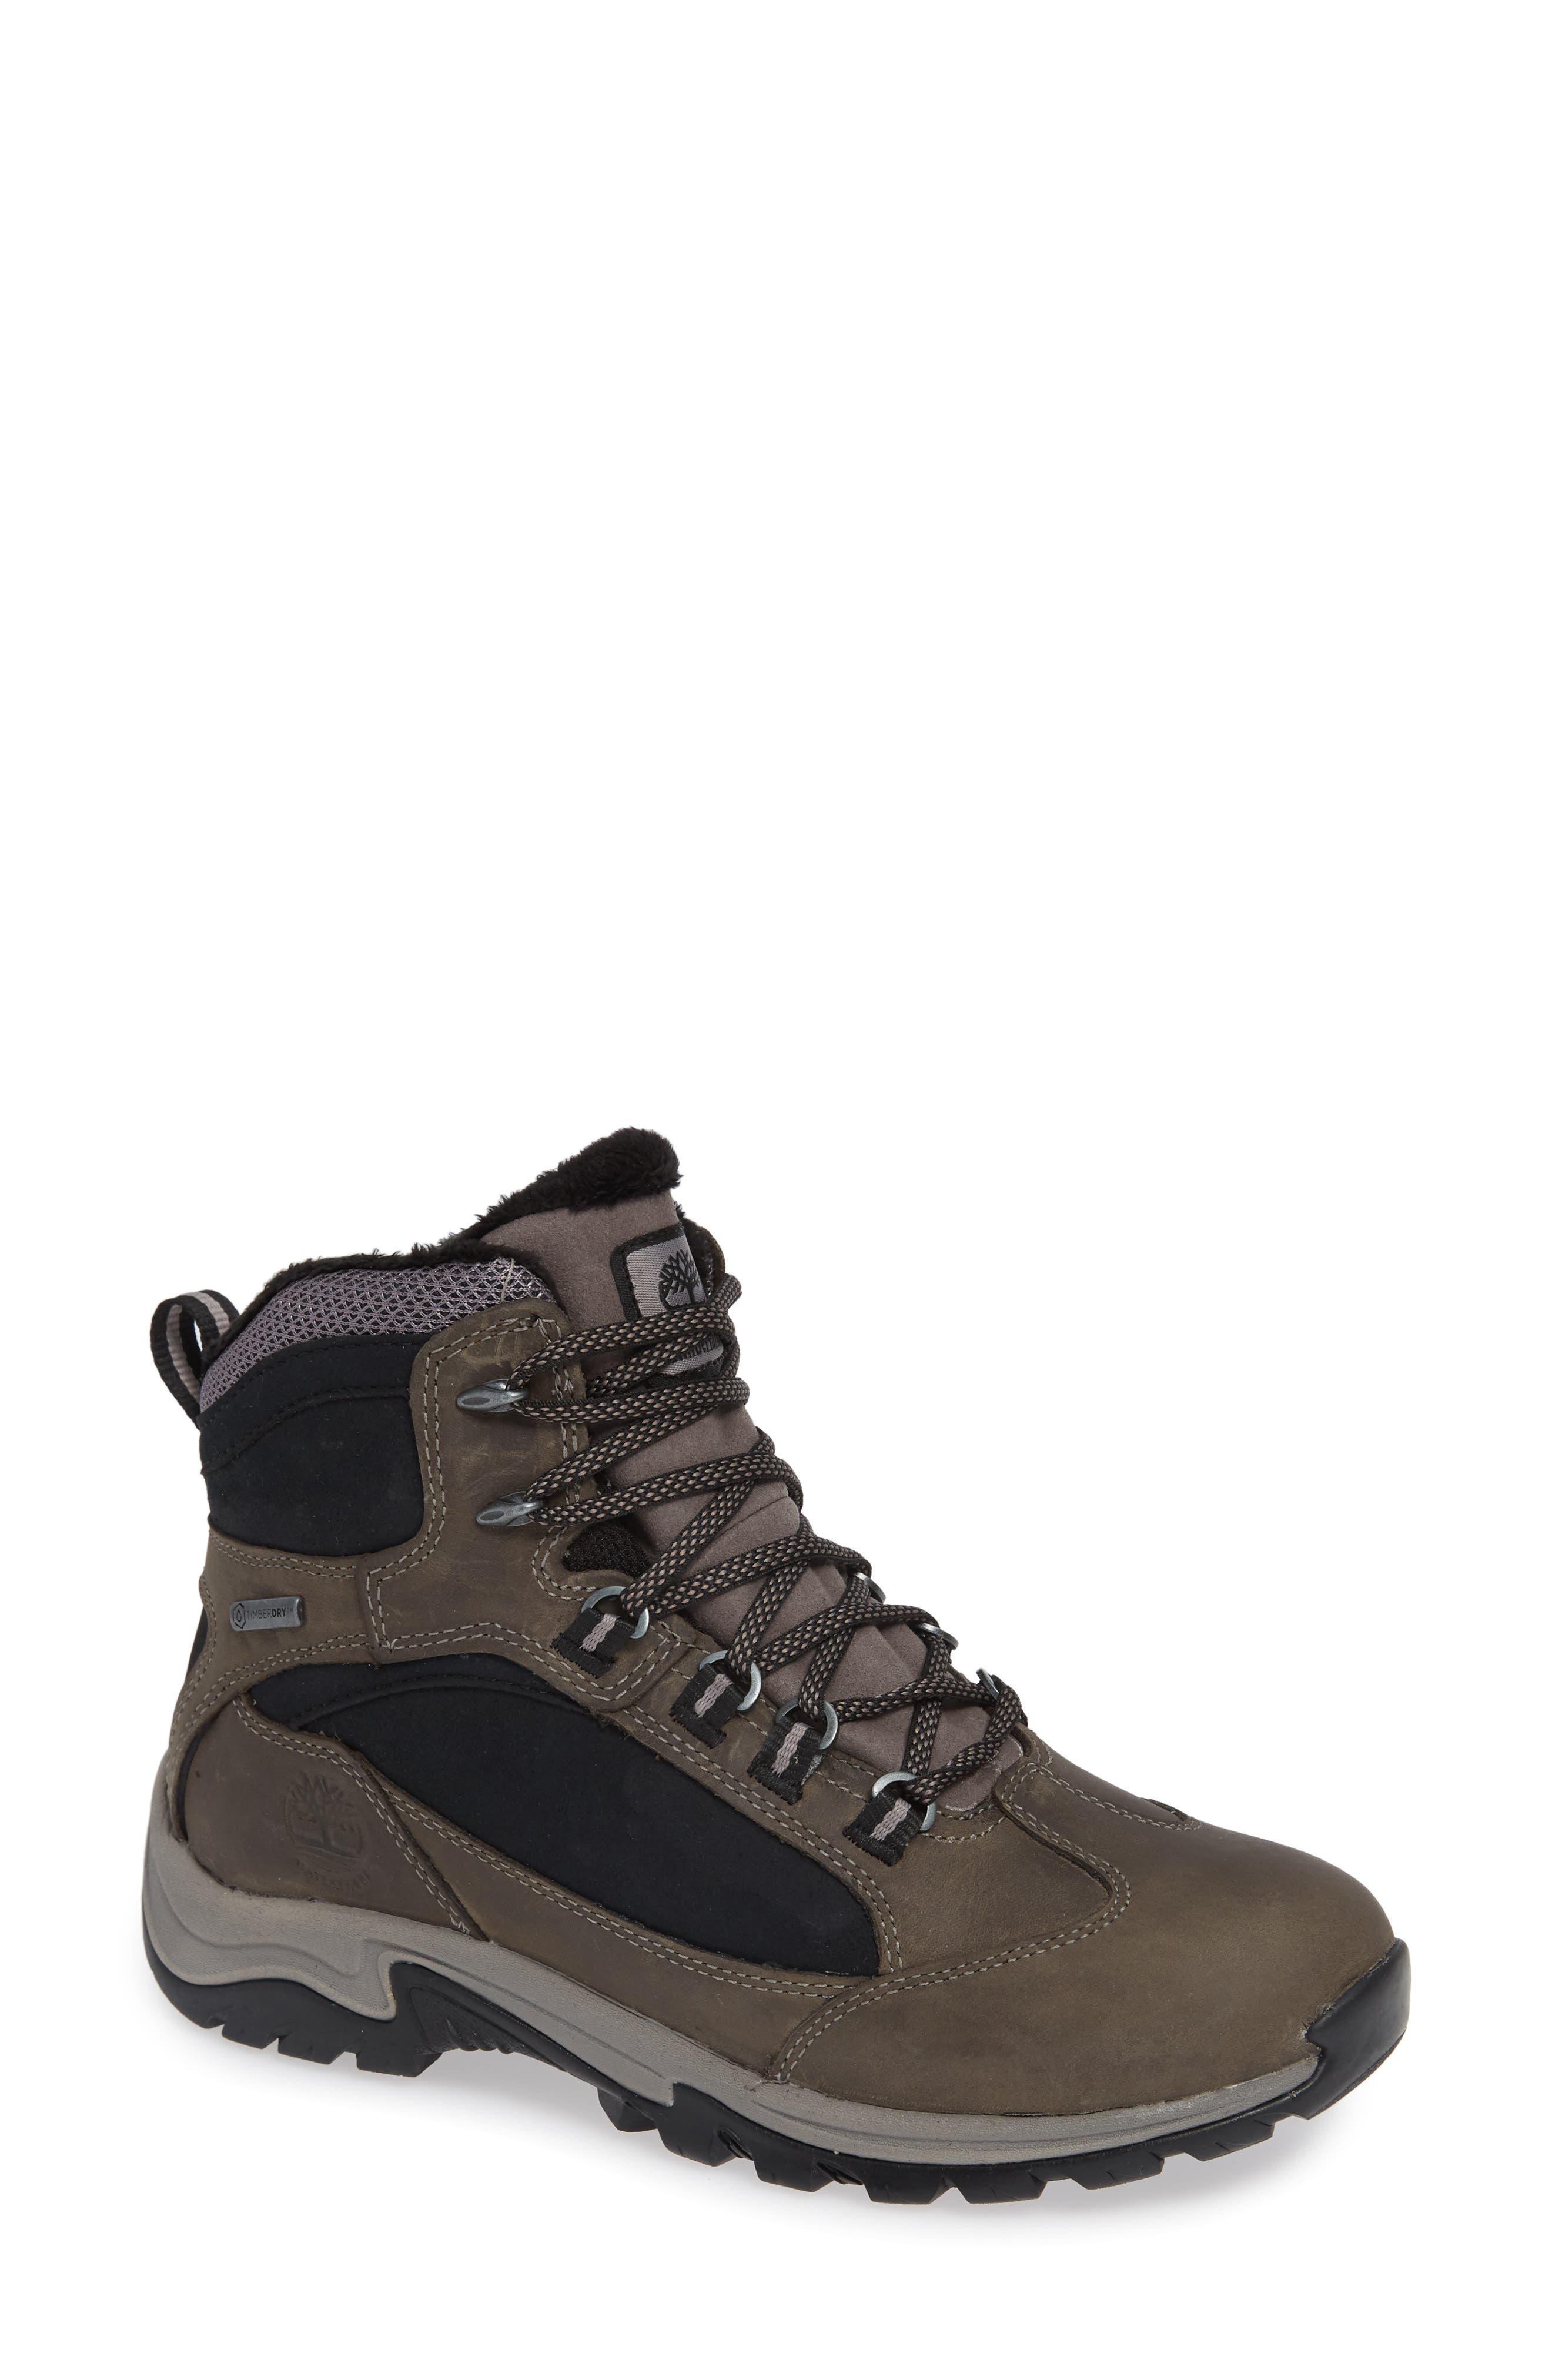 Mt. Maddsen Waterproof Winter Boot,                         Main,                         color, 030